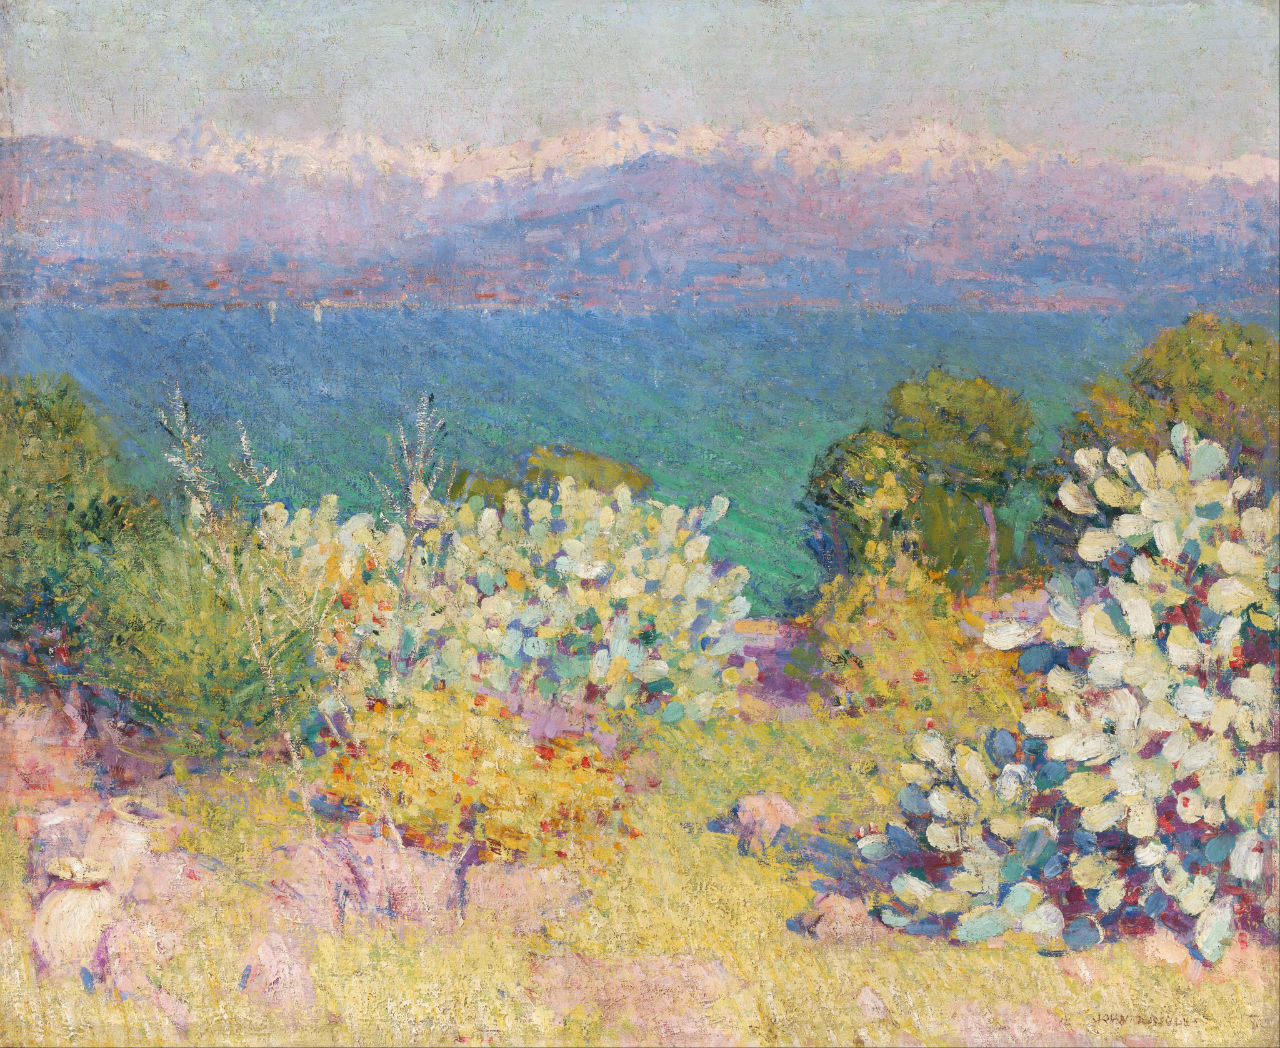 4-Живопись_Джон-Питер-Рассел_In-the-Morning-Alpes-Maritimes-from-Antibes-1891 (1).jpg